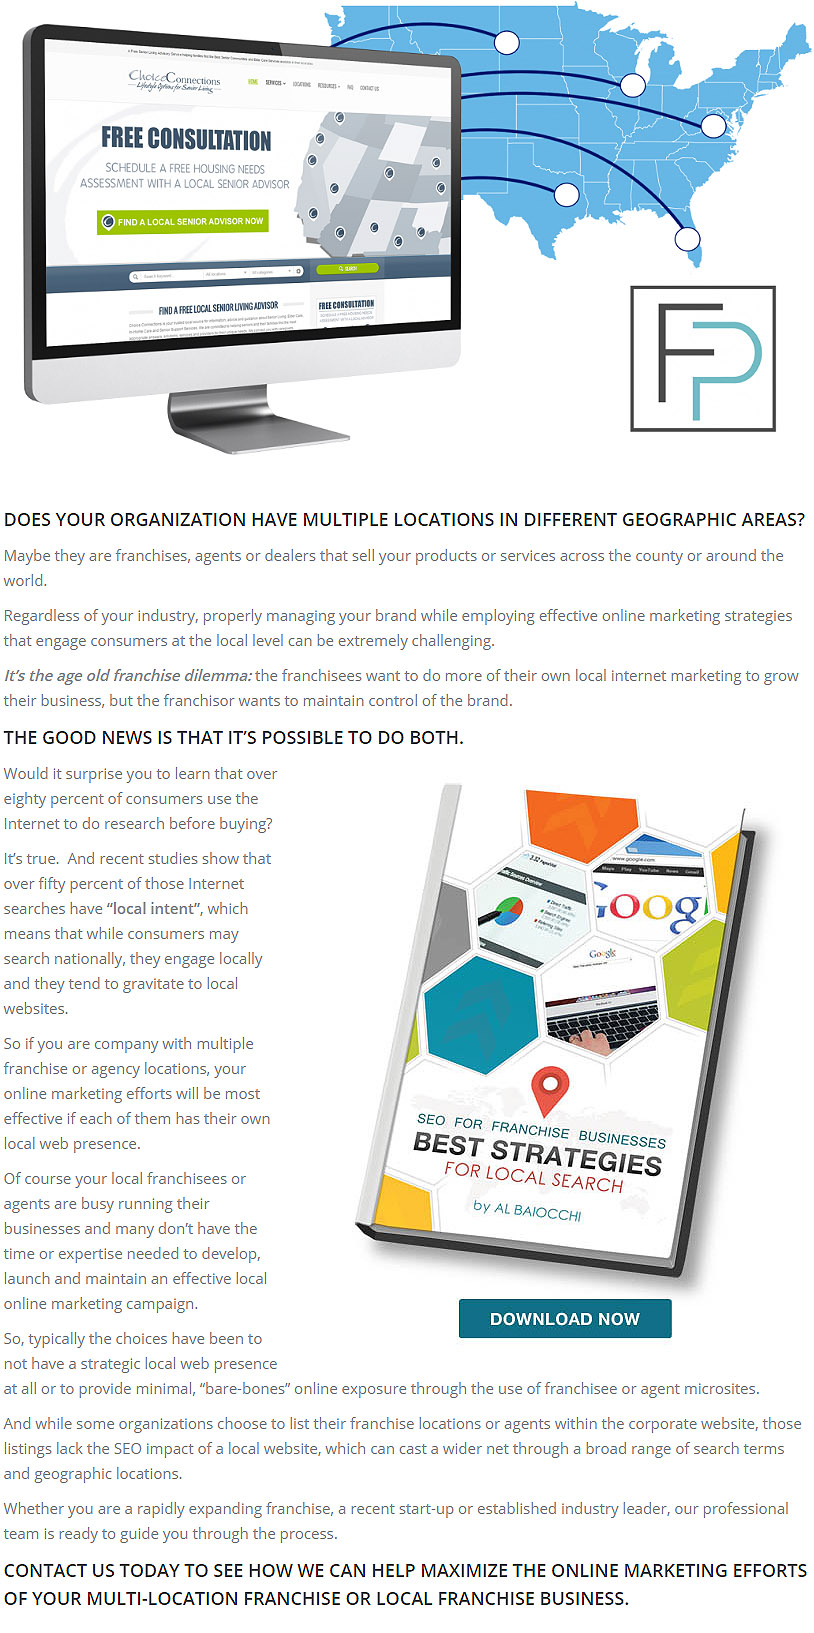 FrontPage Interactive, LLC, best website design, best web design web design, web design company, web design example, web design guide, web design guidelines